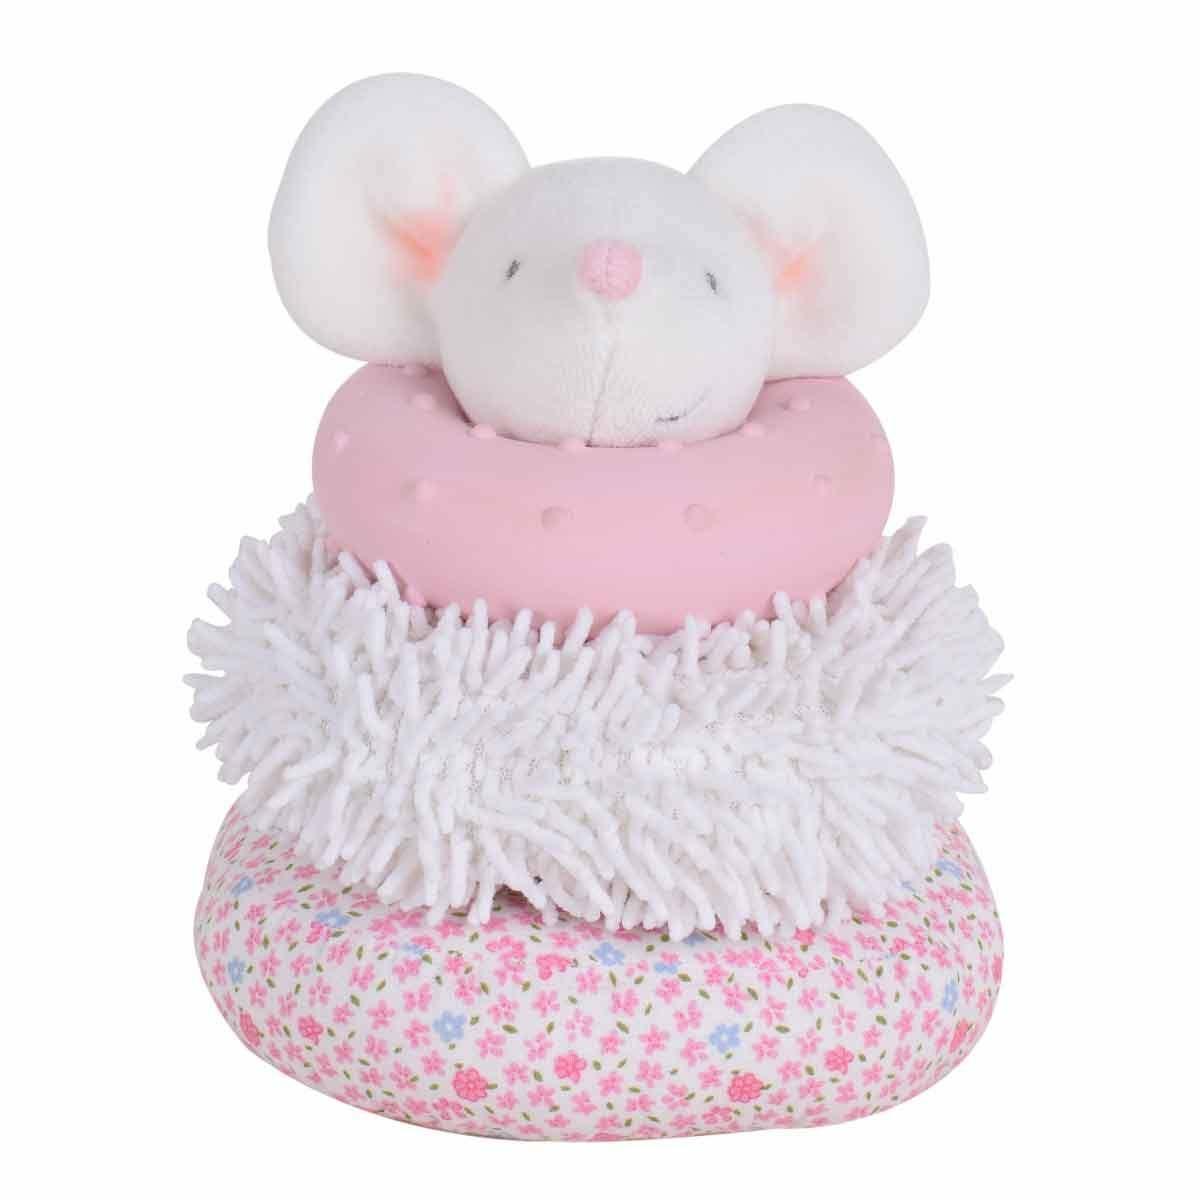 Tikiri Meiya the Mouse - Stacker Toy